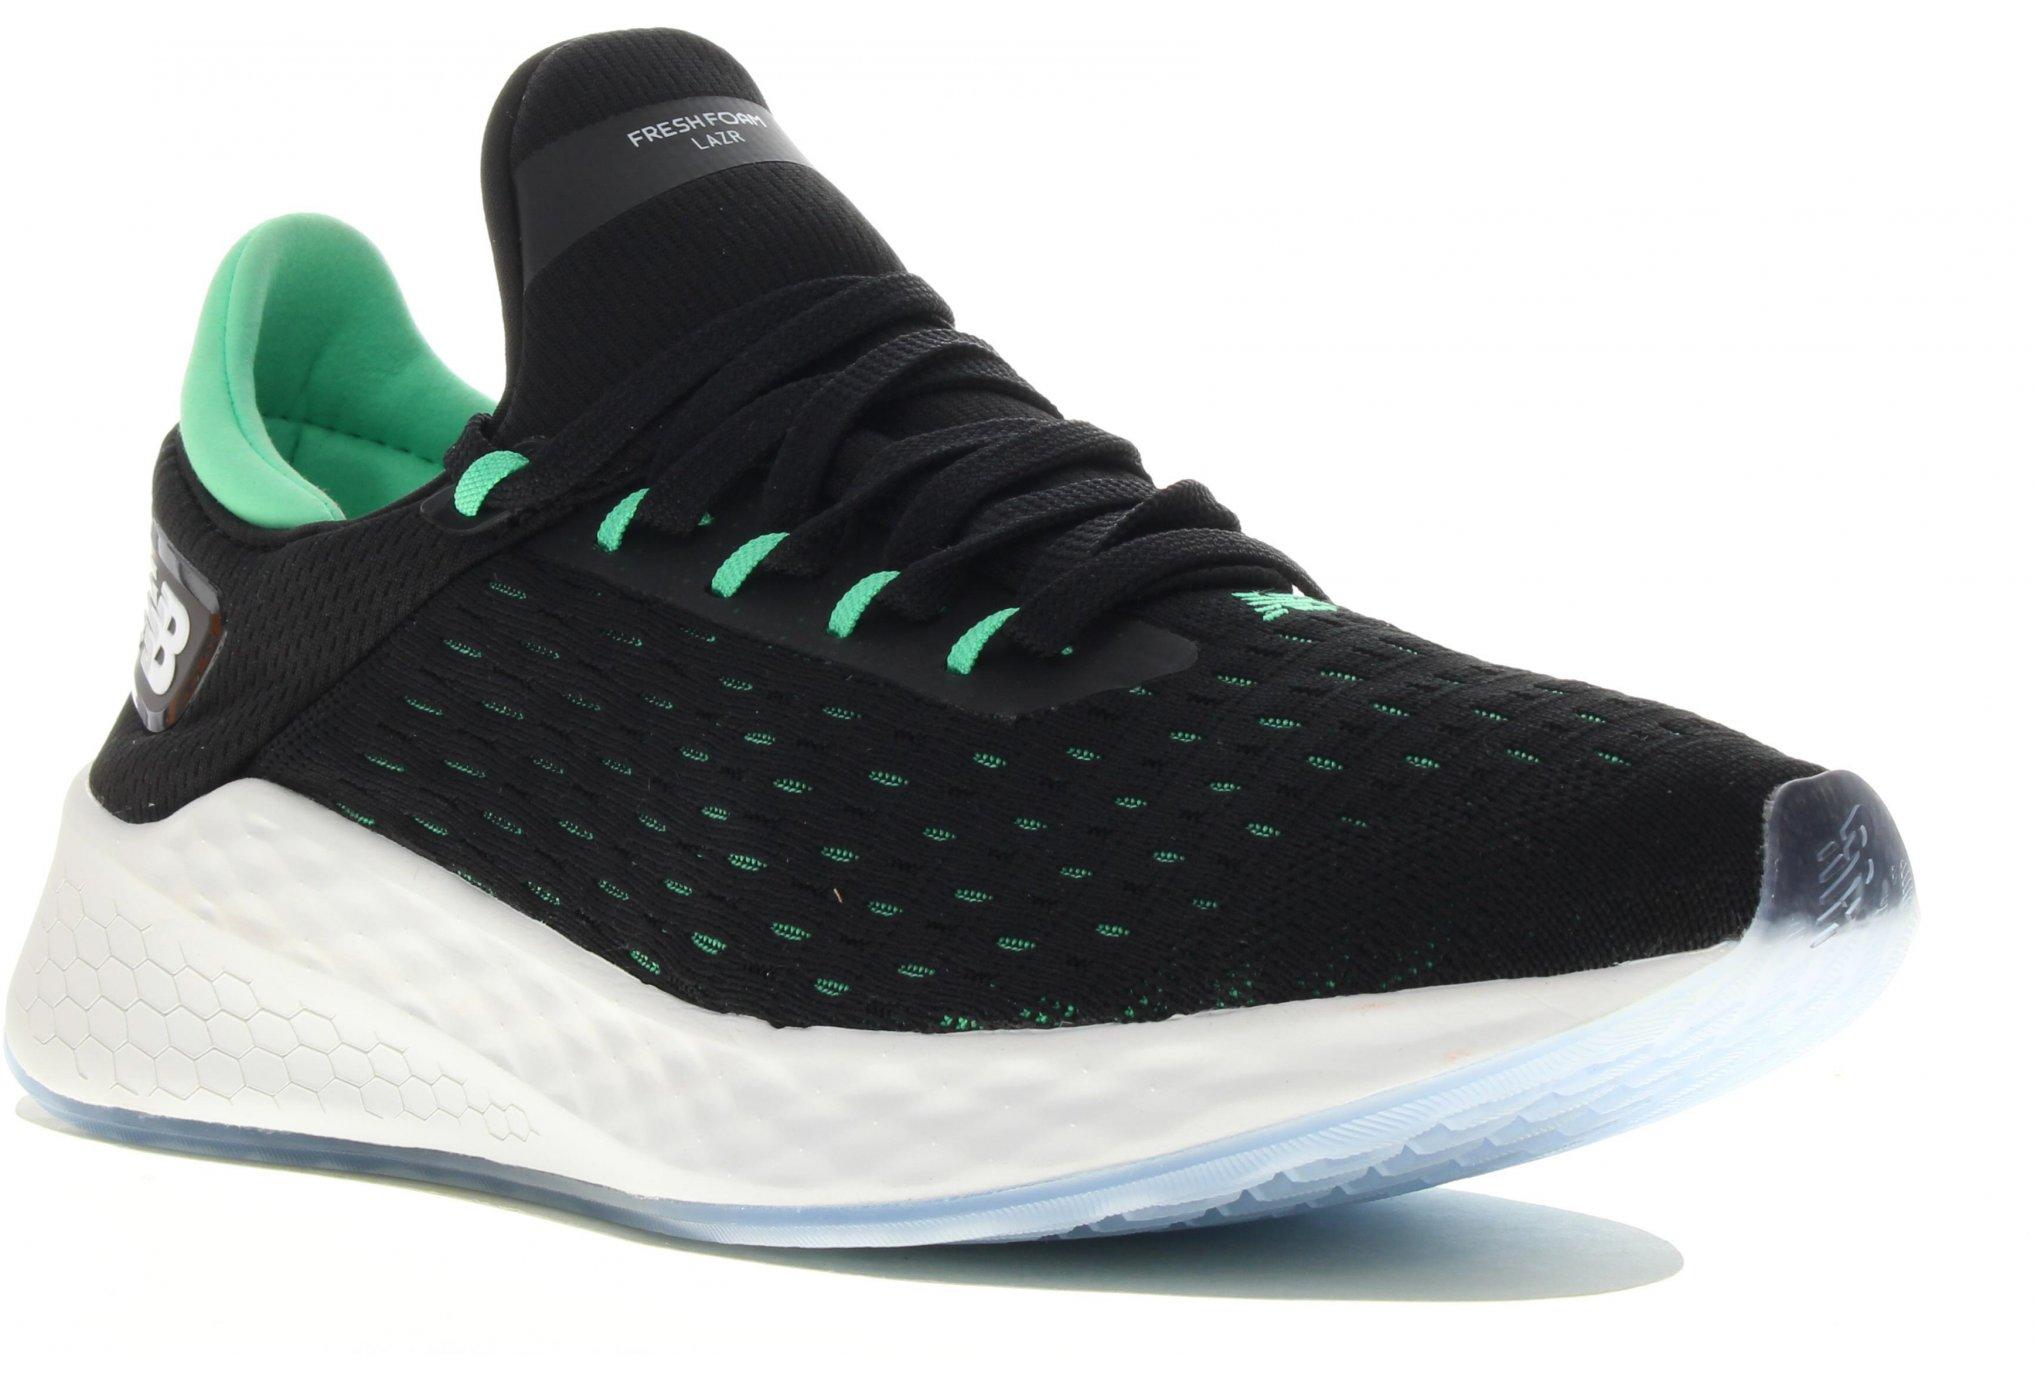 New Balance Fresh Foam Lazr V2 Hypoknit Chaussures homme